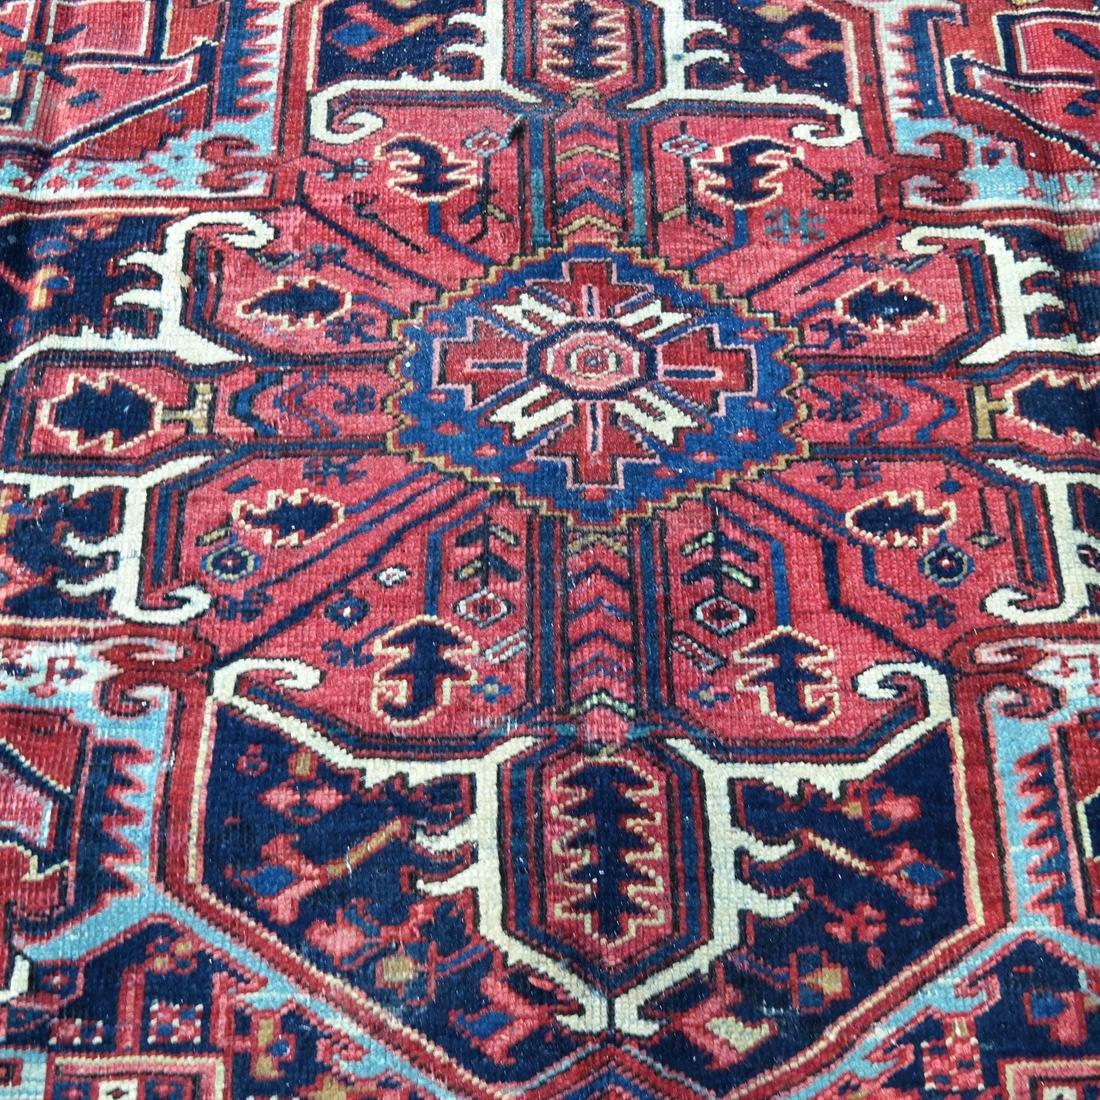 Antique Iranian Heriz Carpet, 9 x 12 - 4